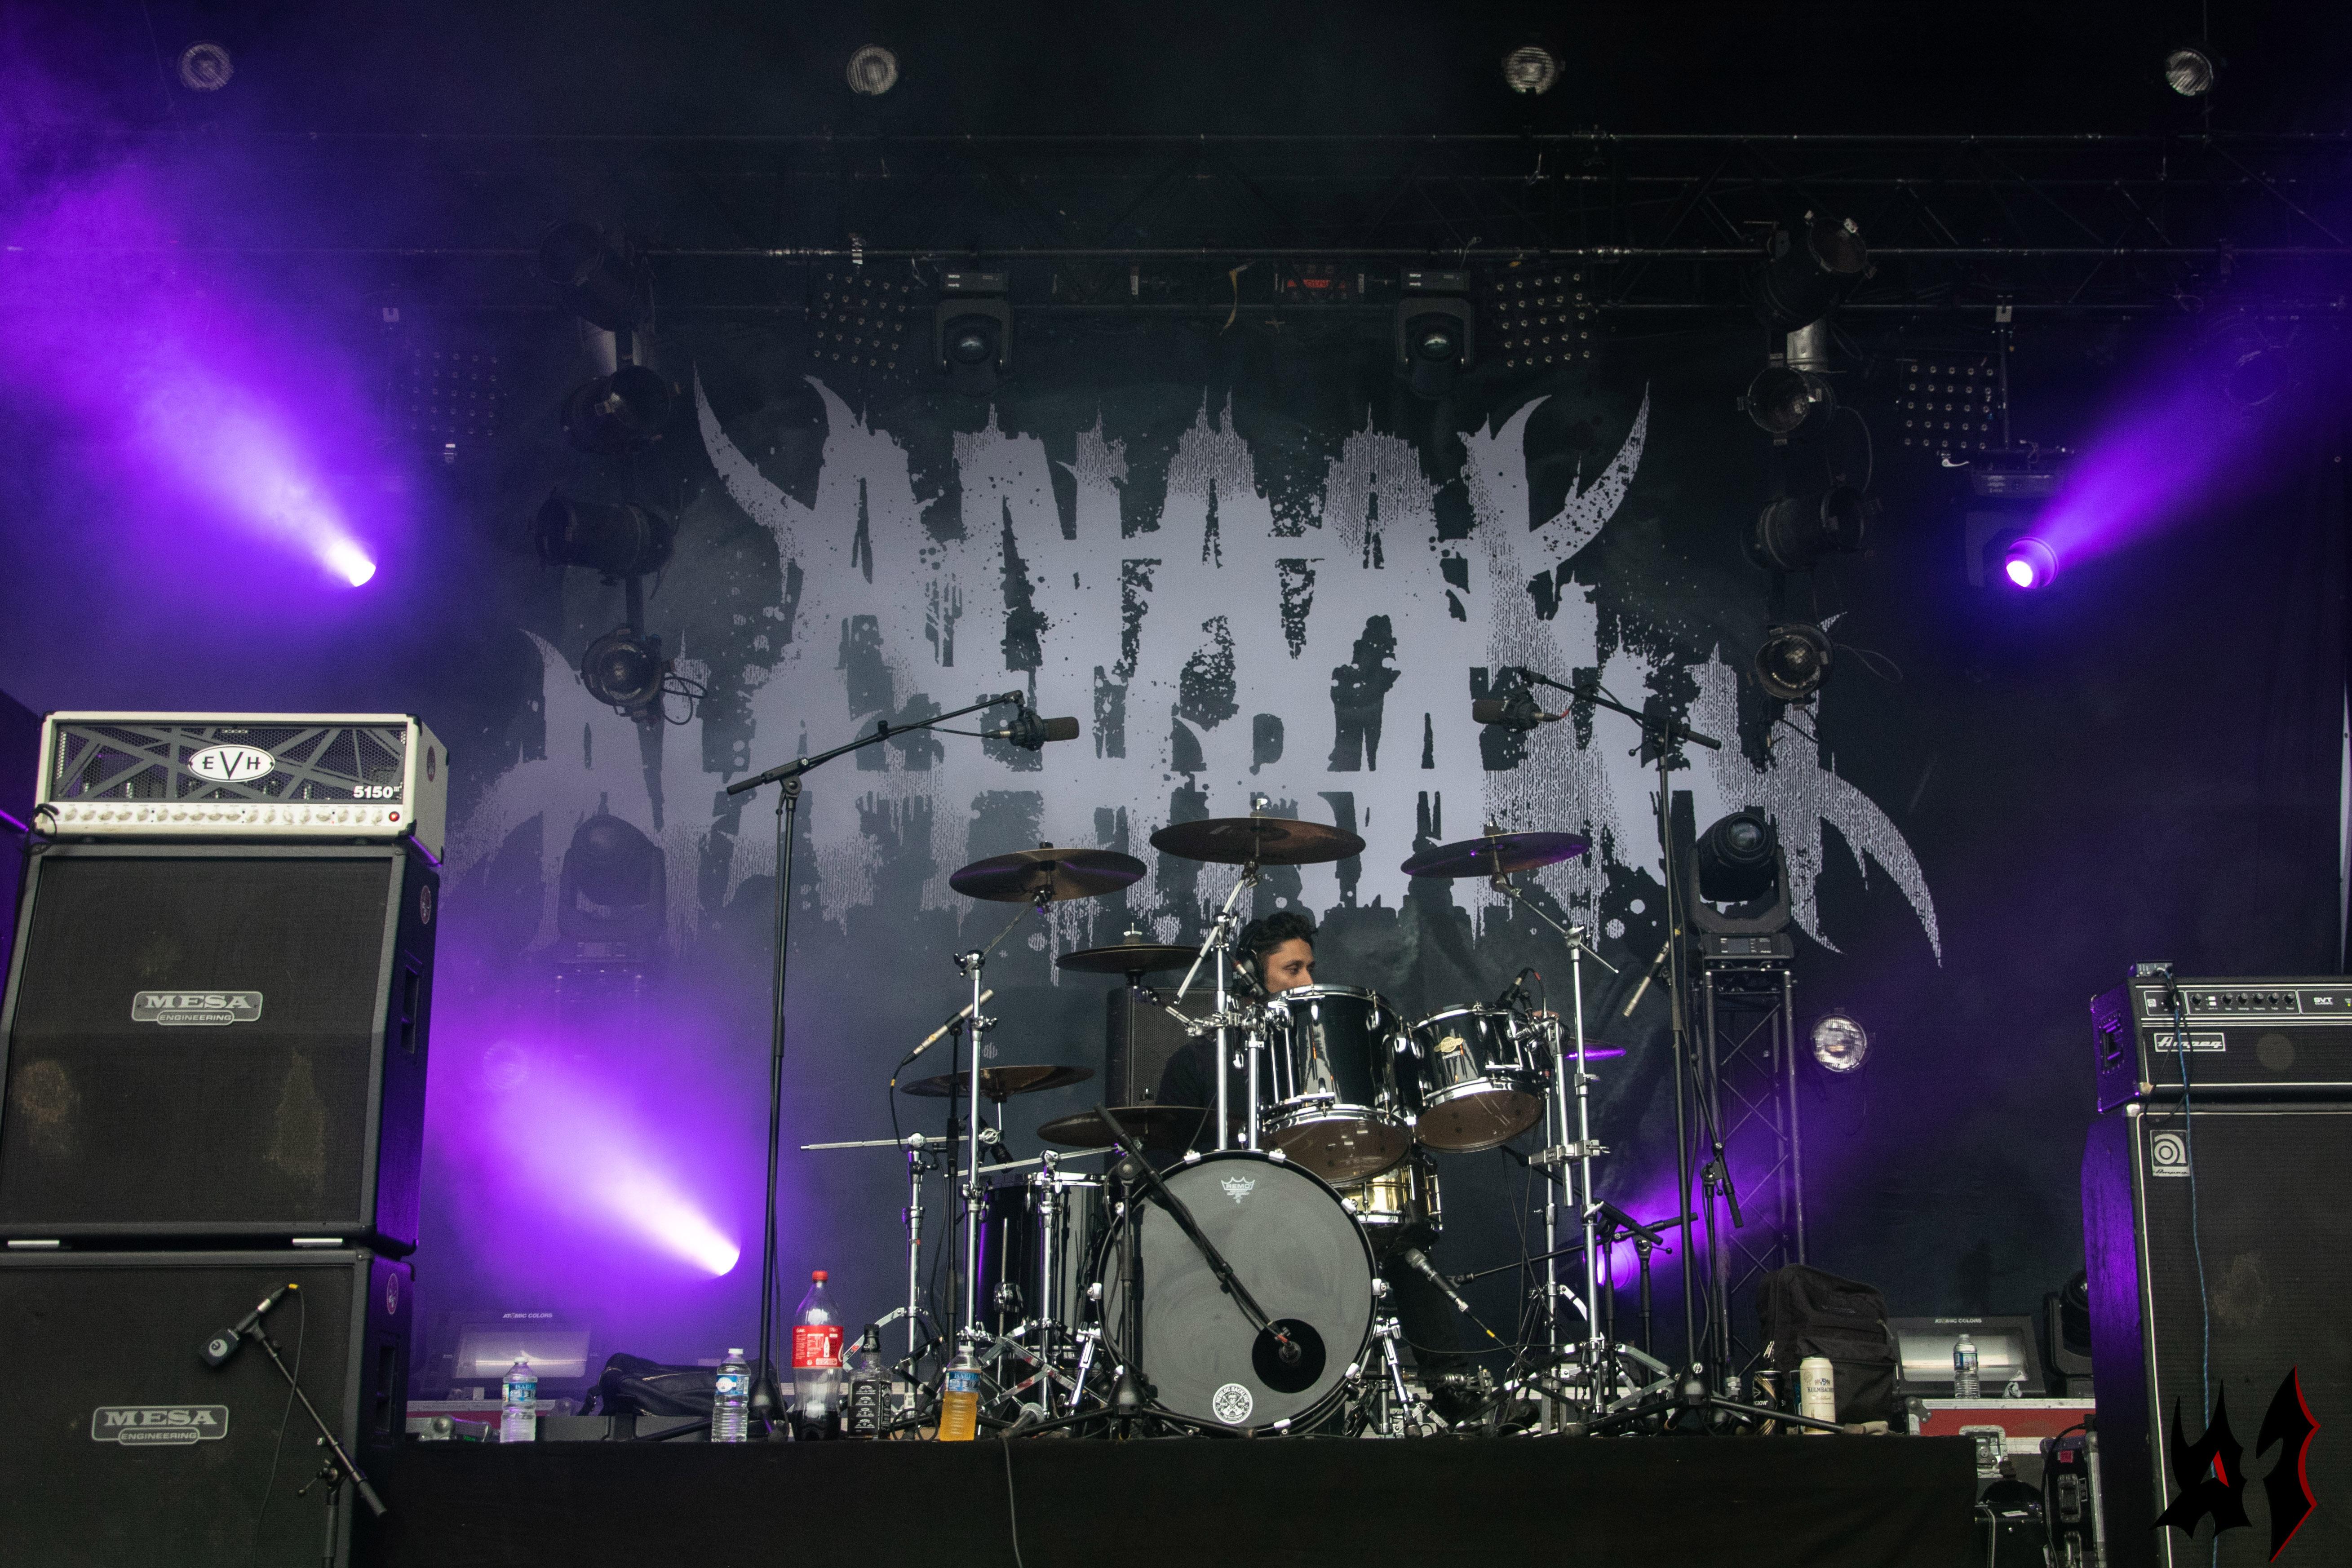 Motocultor - Anaal Nathrakh - 2